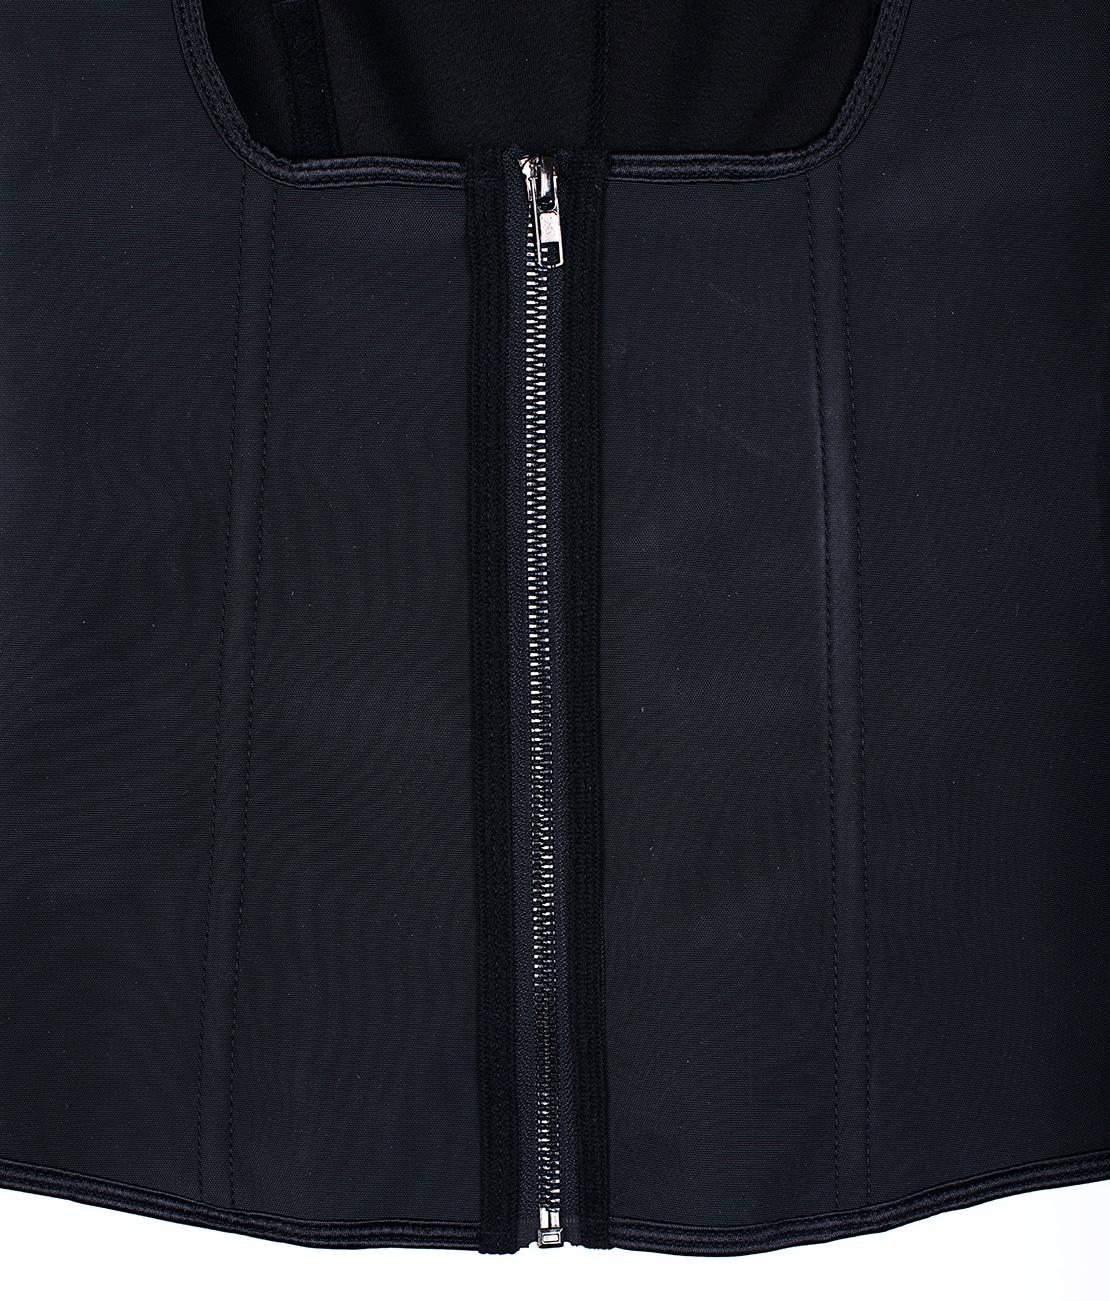 Corset Latex Remodelant Noir Packshot Detail 1